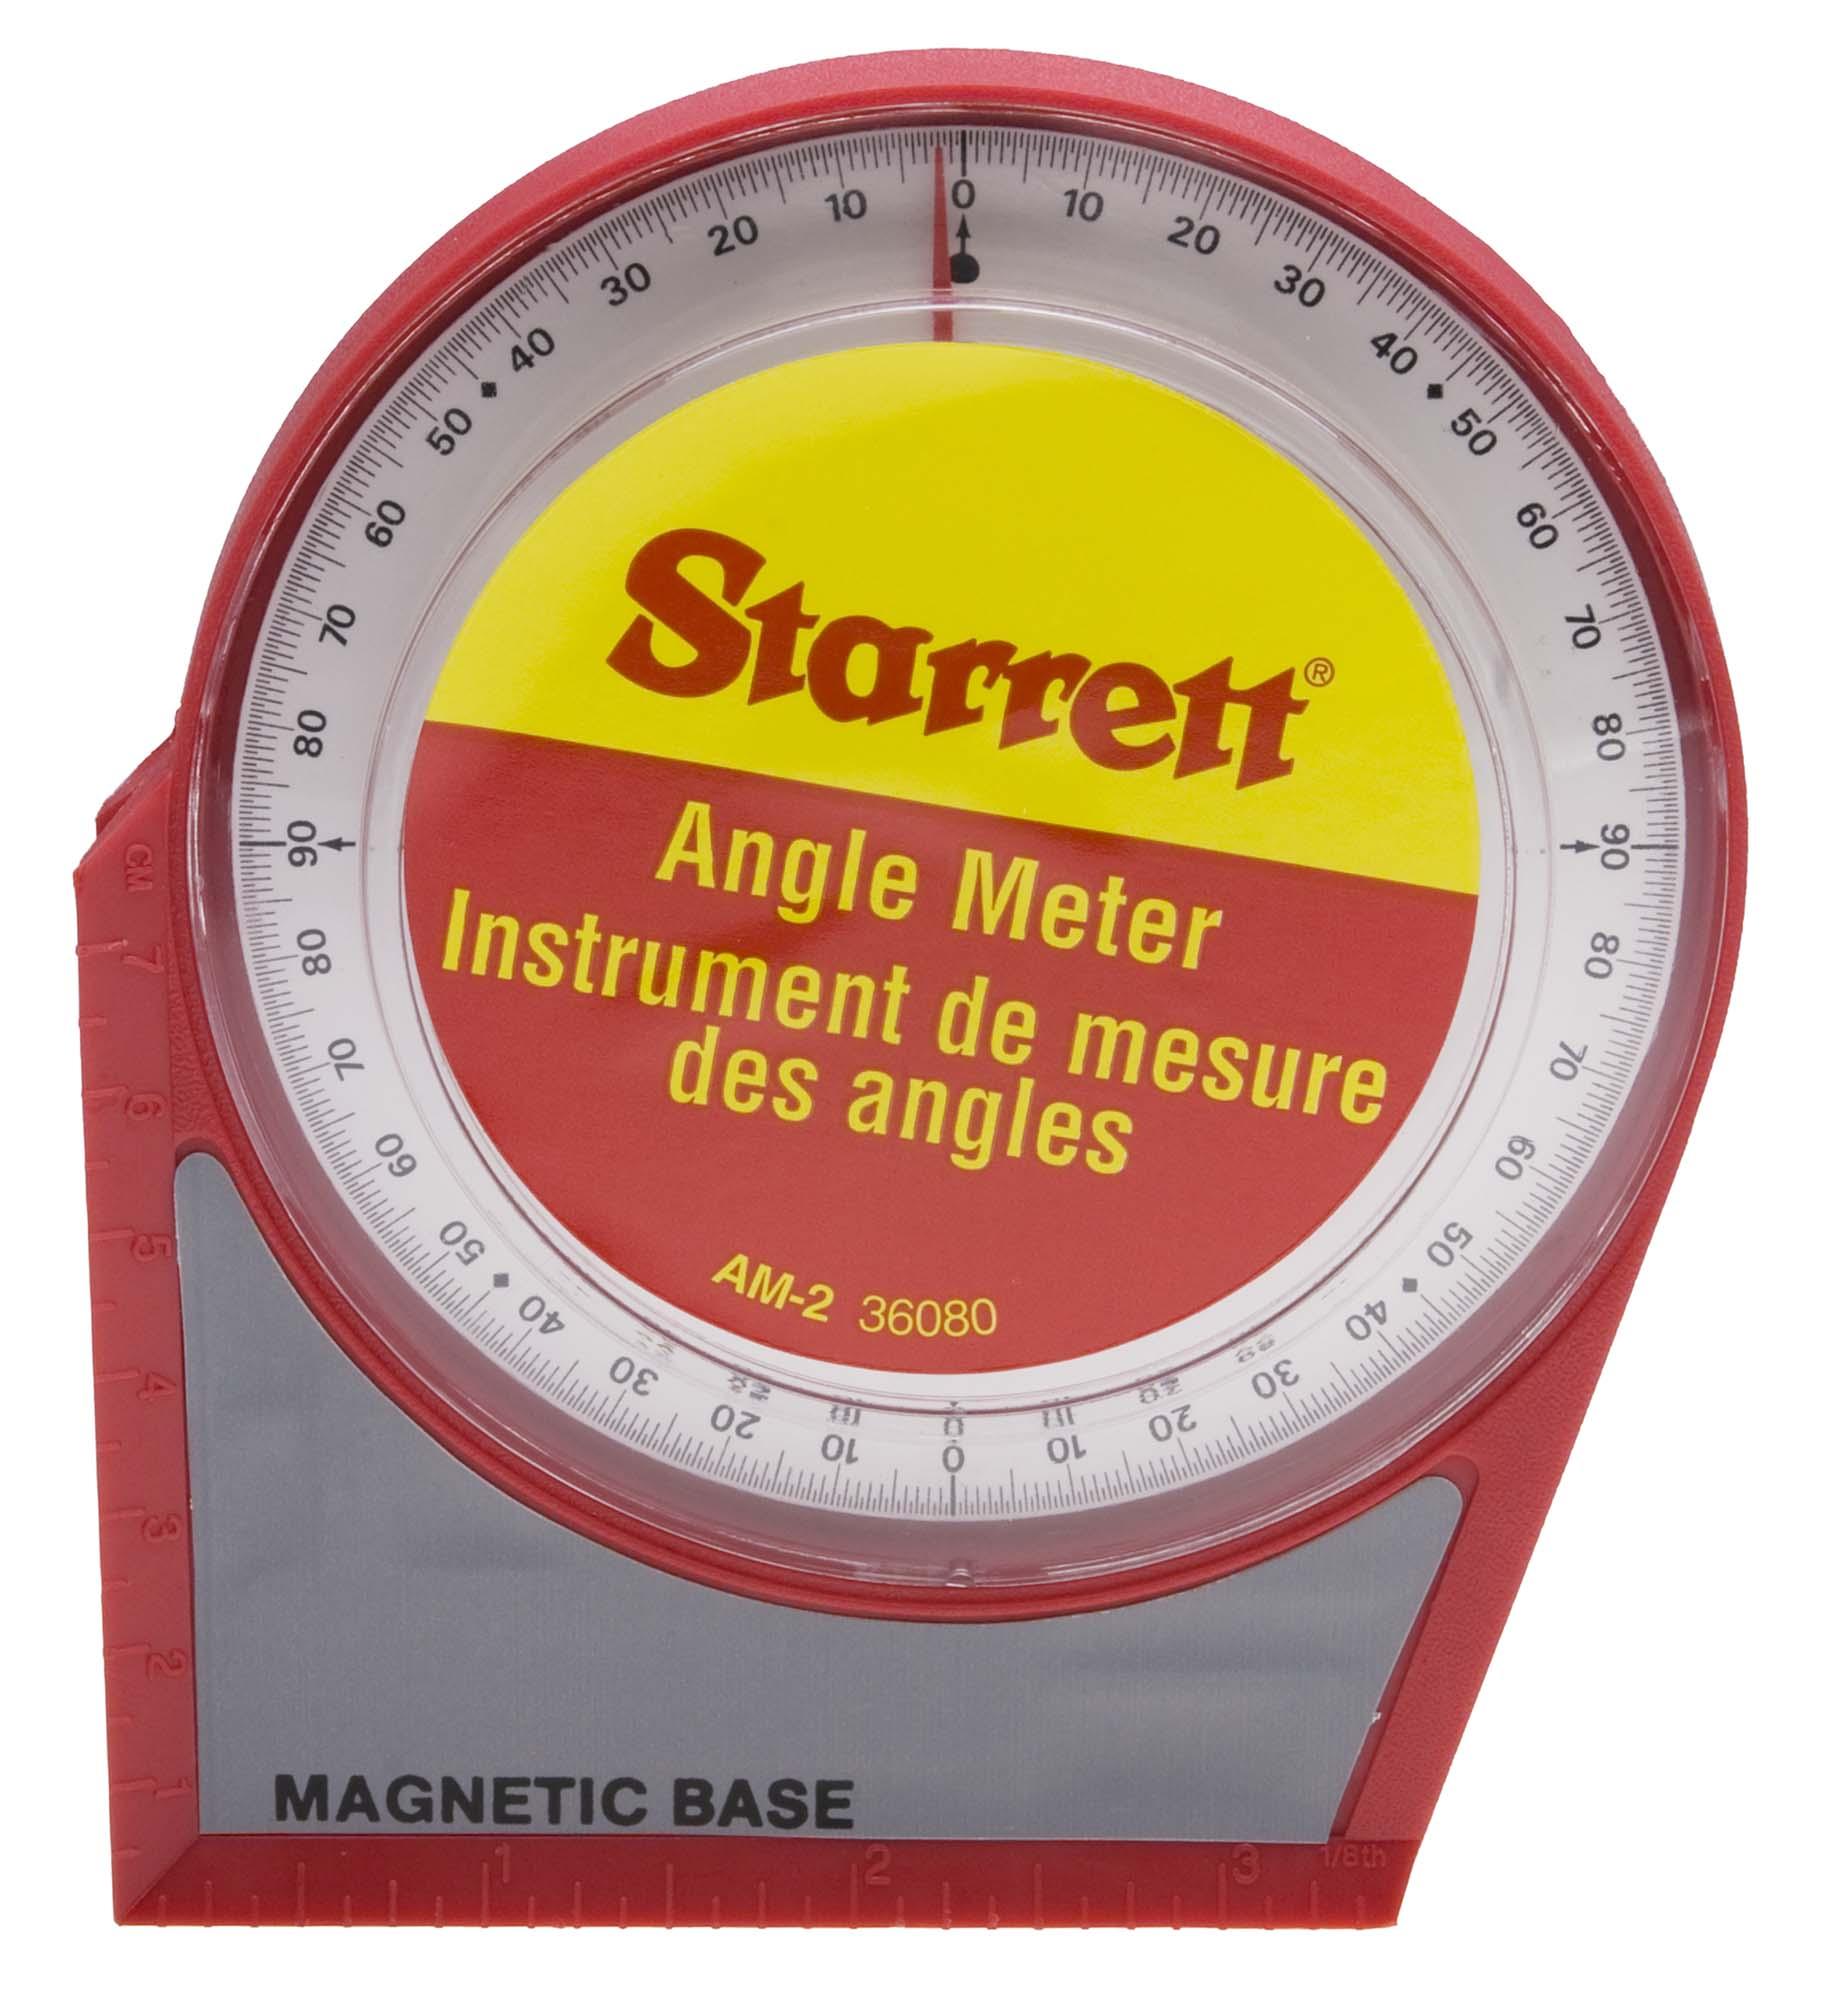 Starrett AM2 Angle Meter